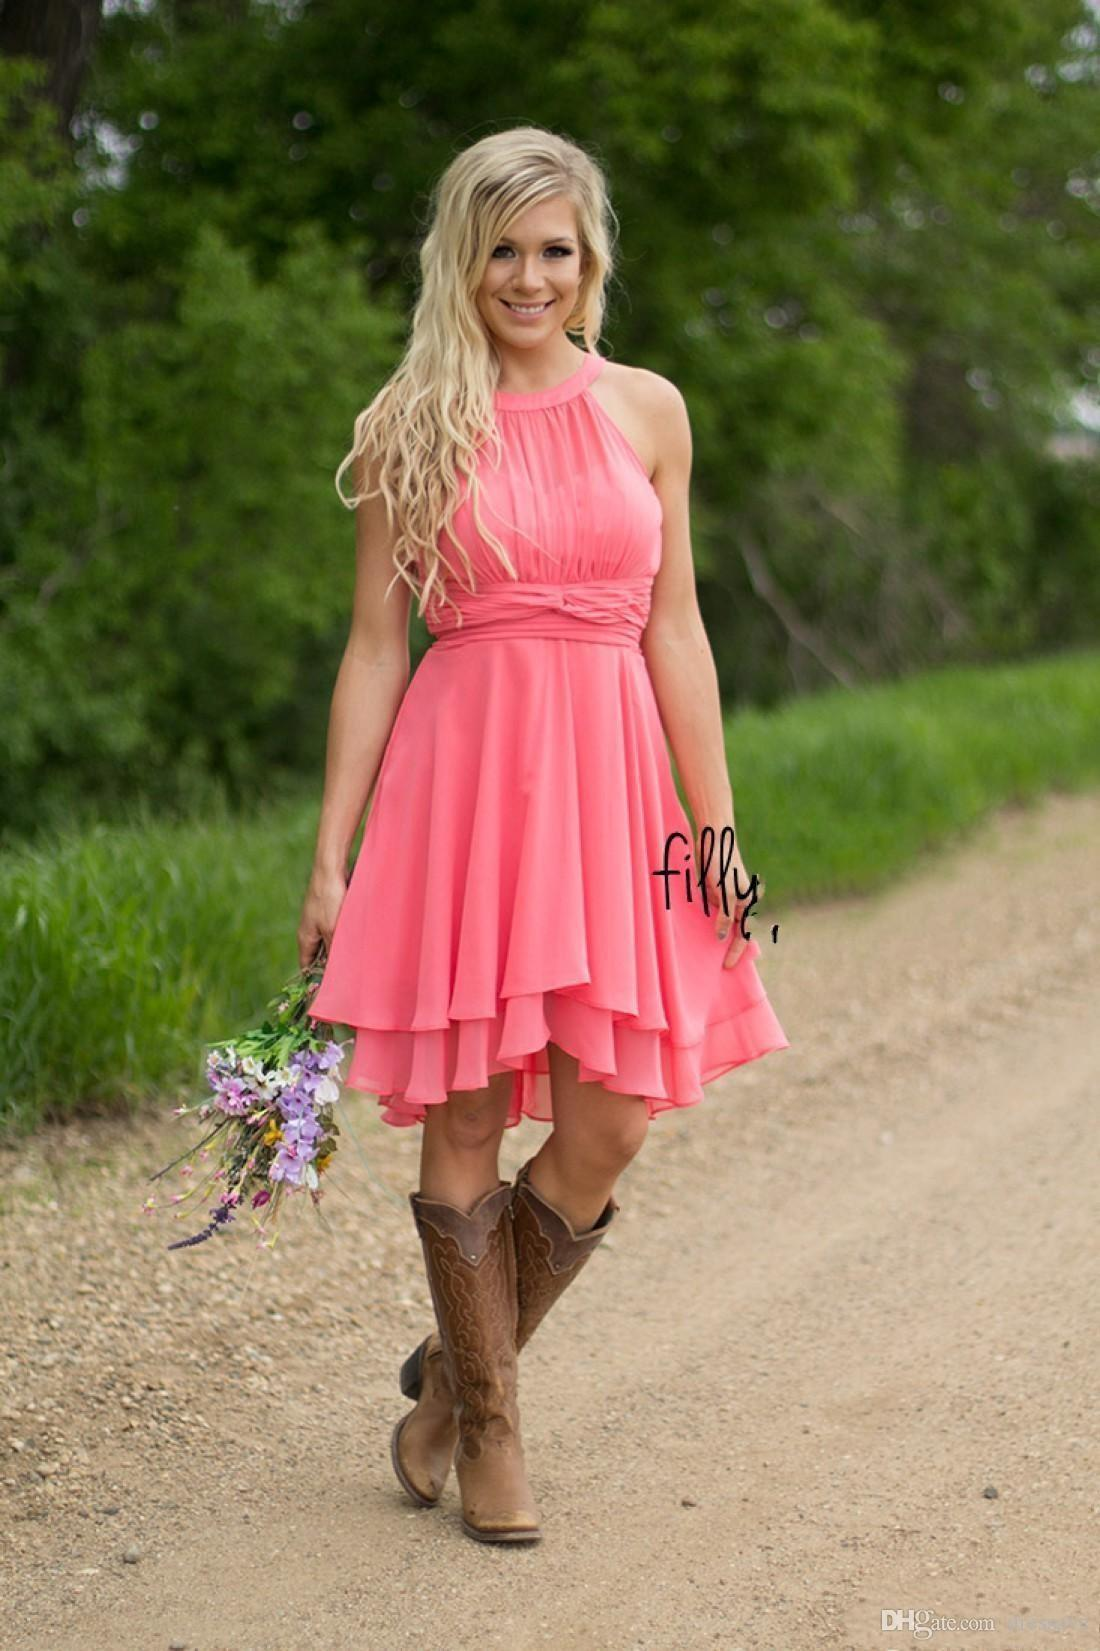 2018 landelijke stijl korte bruidsmeisje jurken watermeloen koningsblauw hoge goedkope halter nek ruches backless goedkope meid van eer jurk